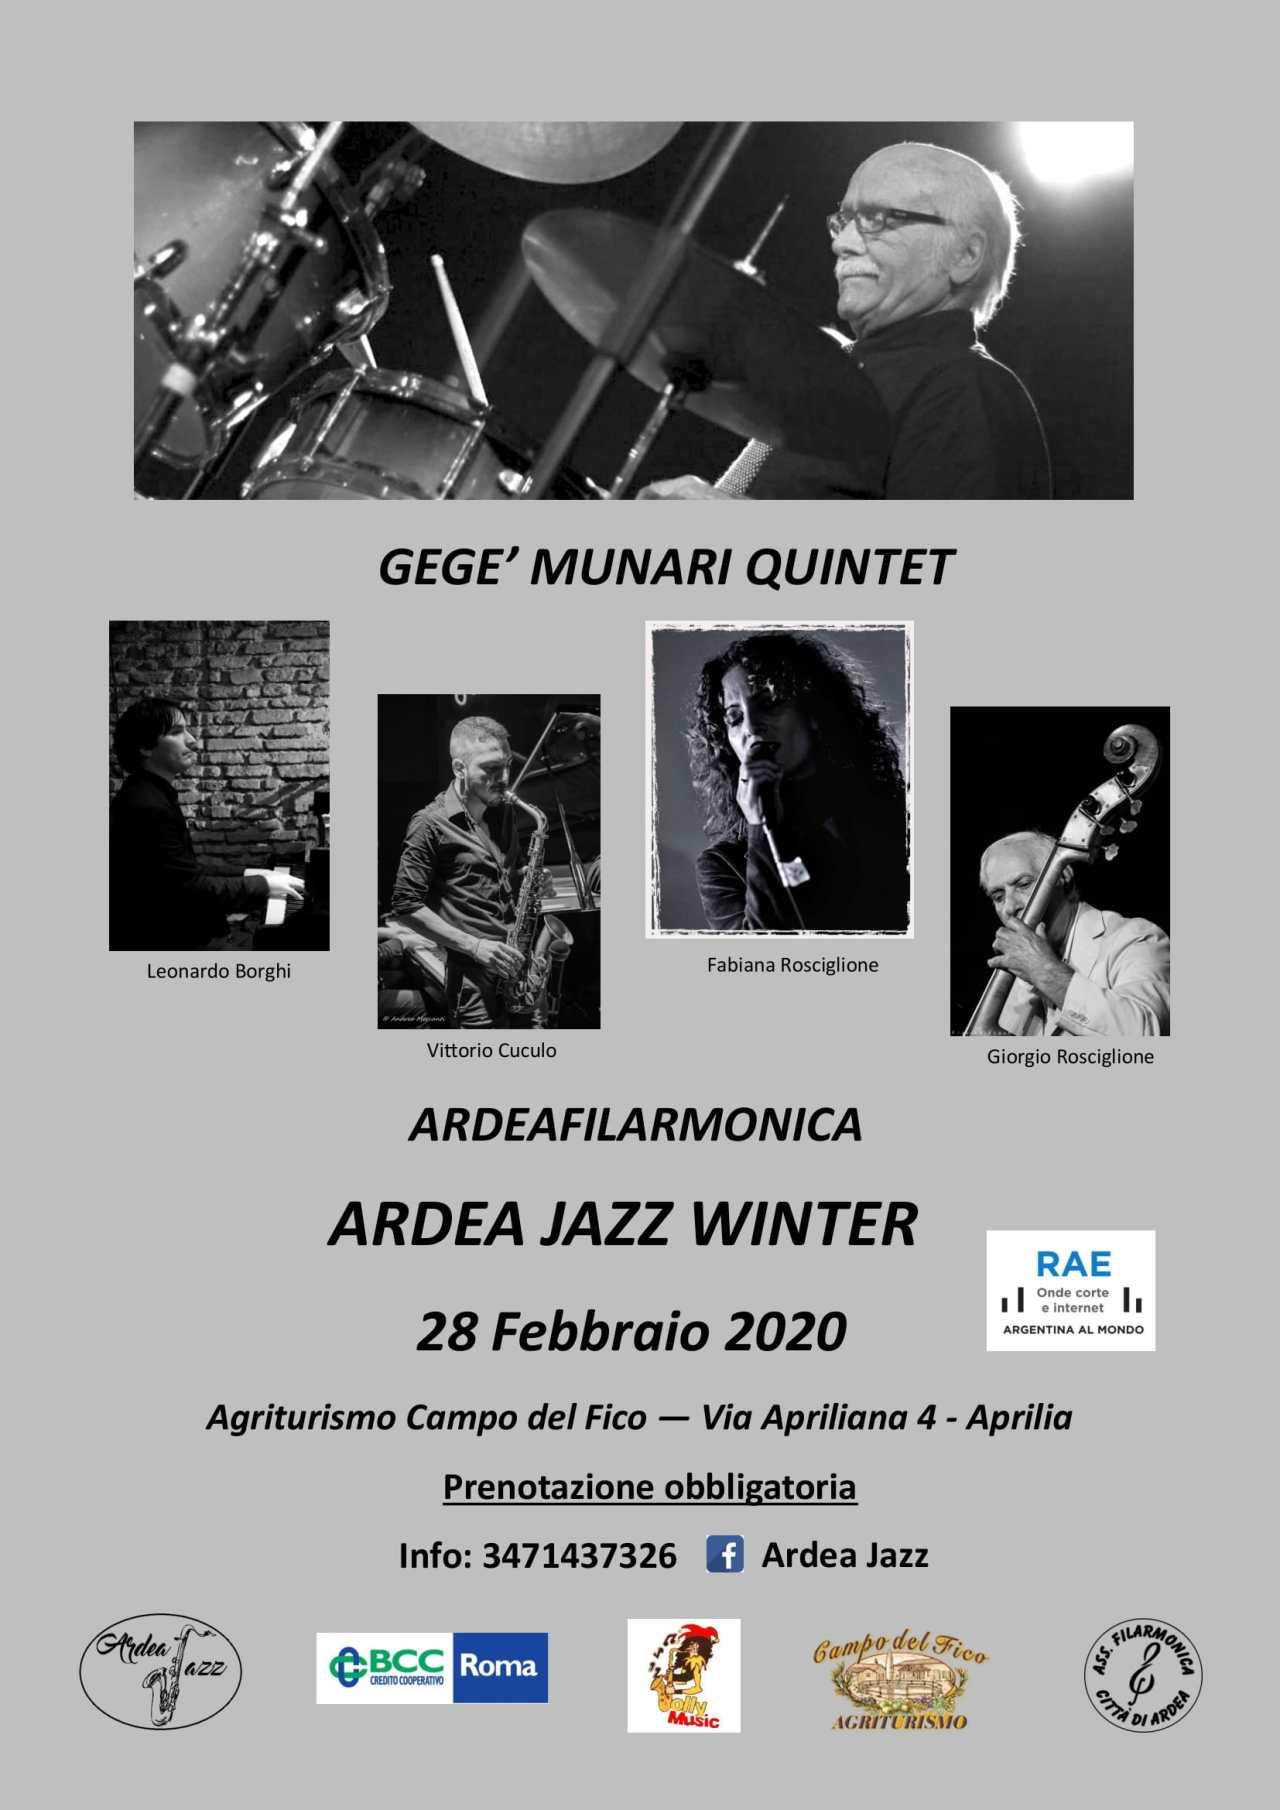 Ardeajazz Winter4ª ed. Special GuestGegè MunariQuintet